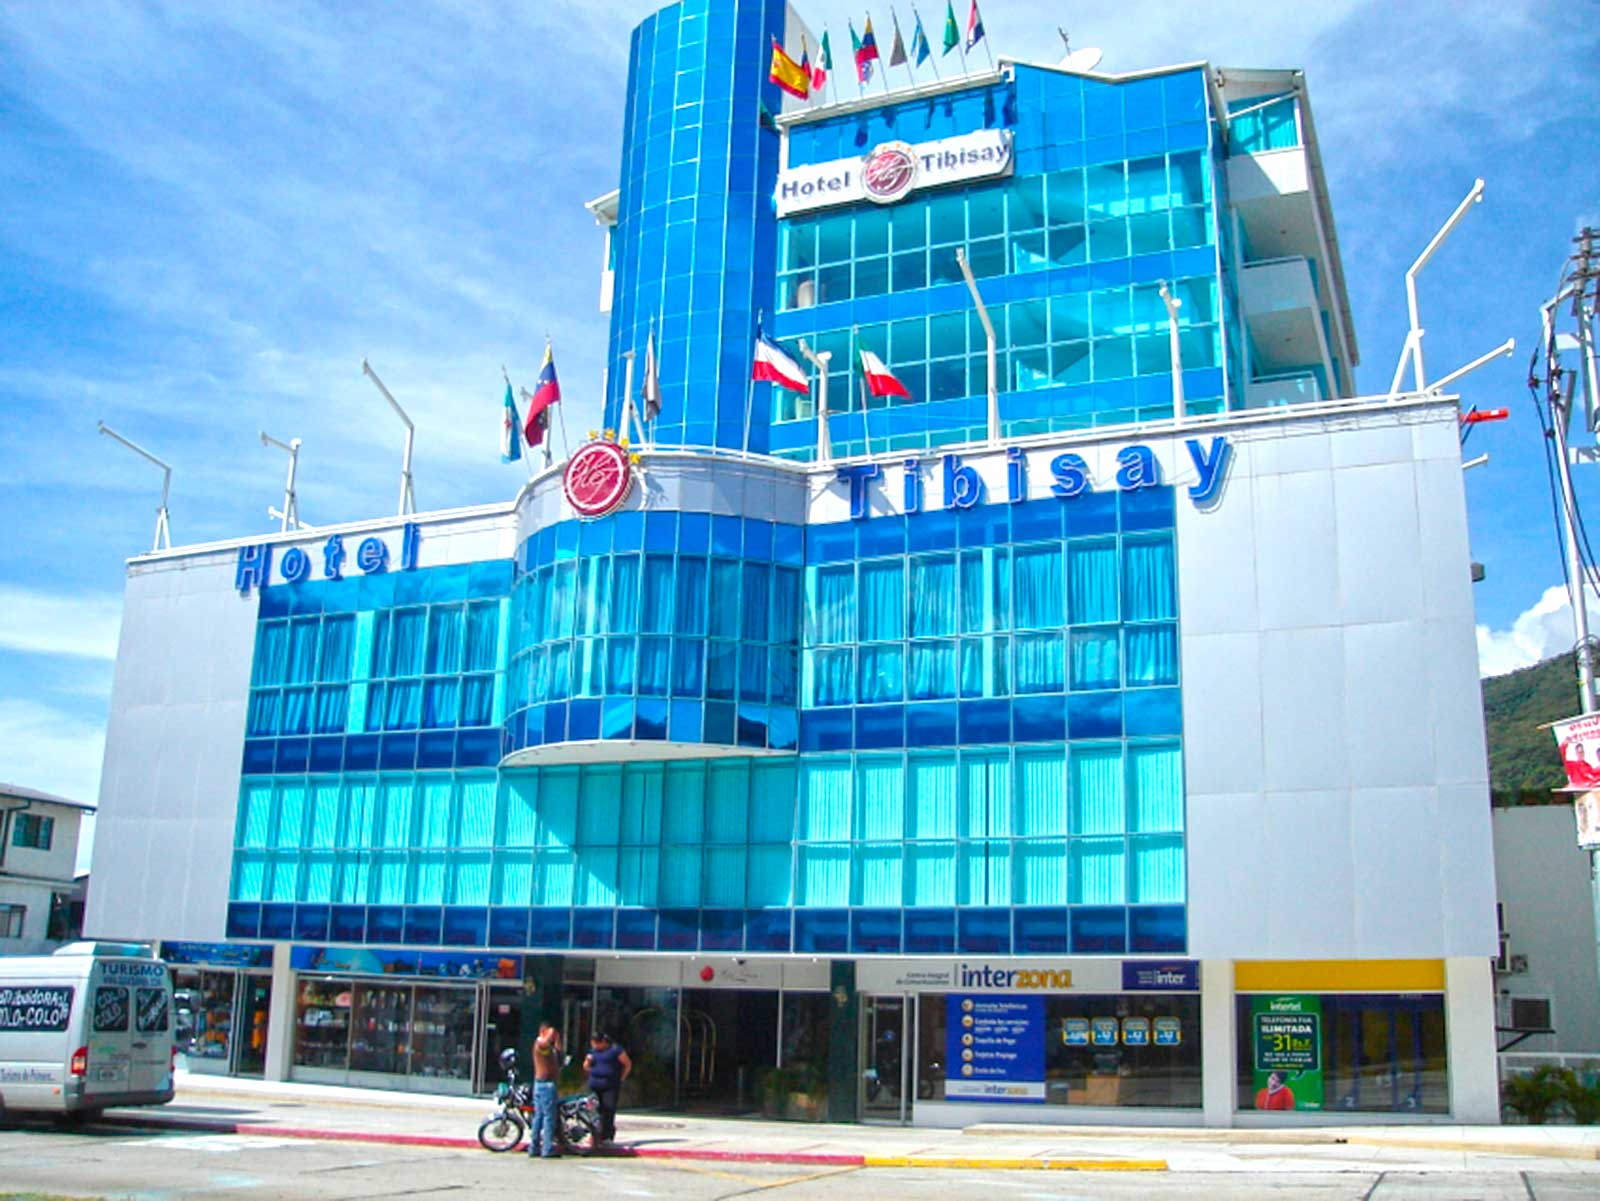 Hotel tibisay m rida venezuela for Piscina climatizada merida